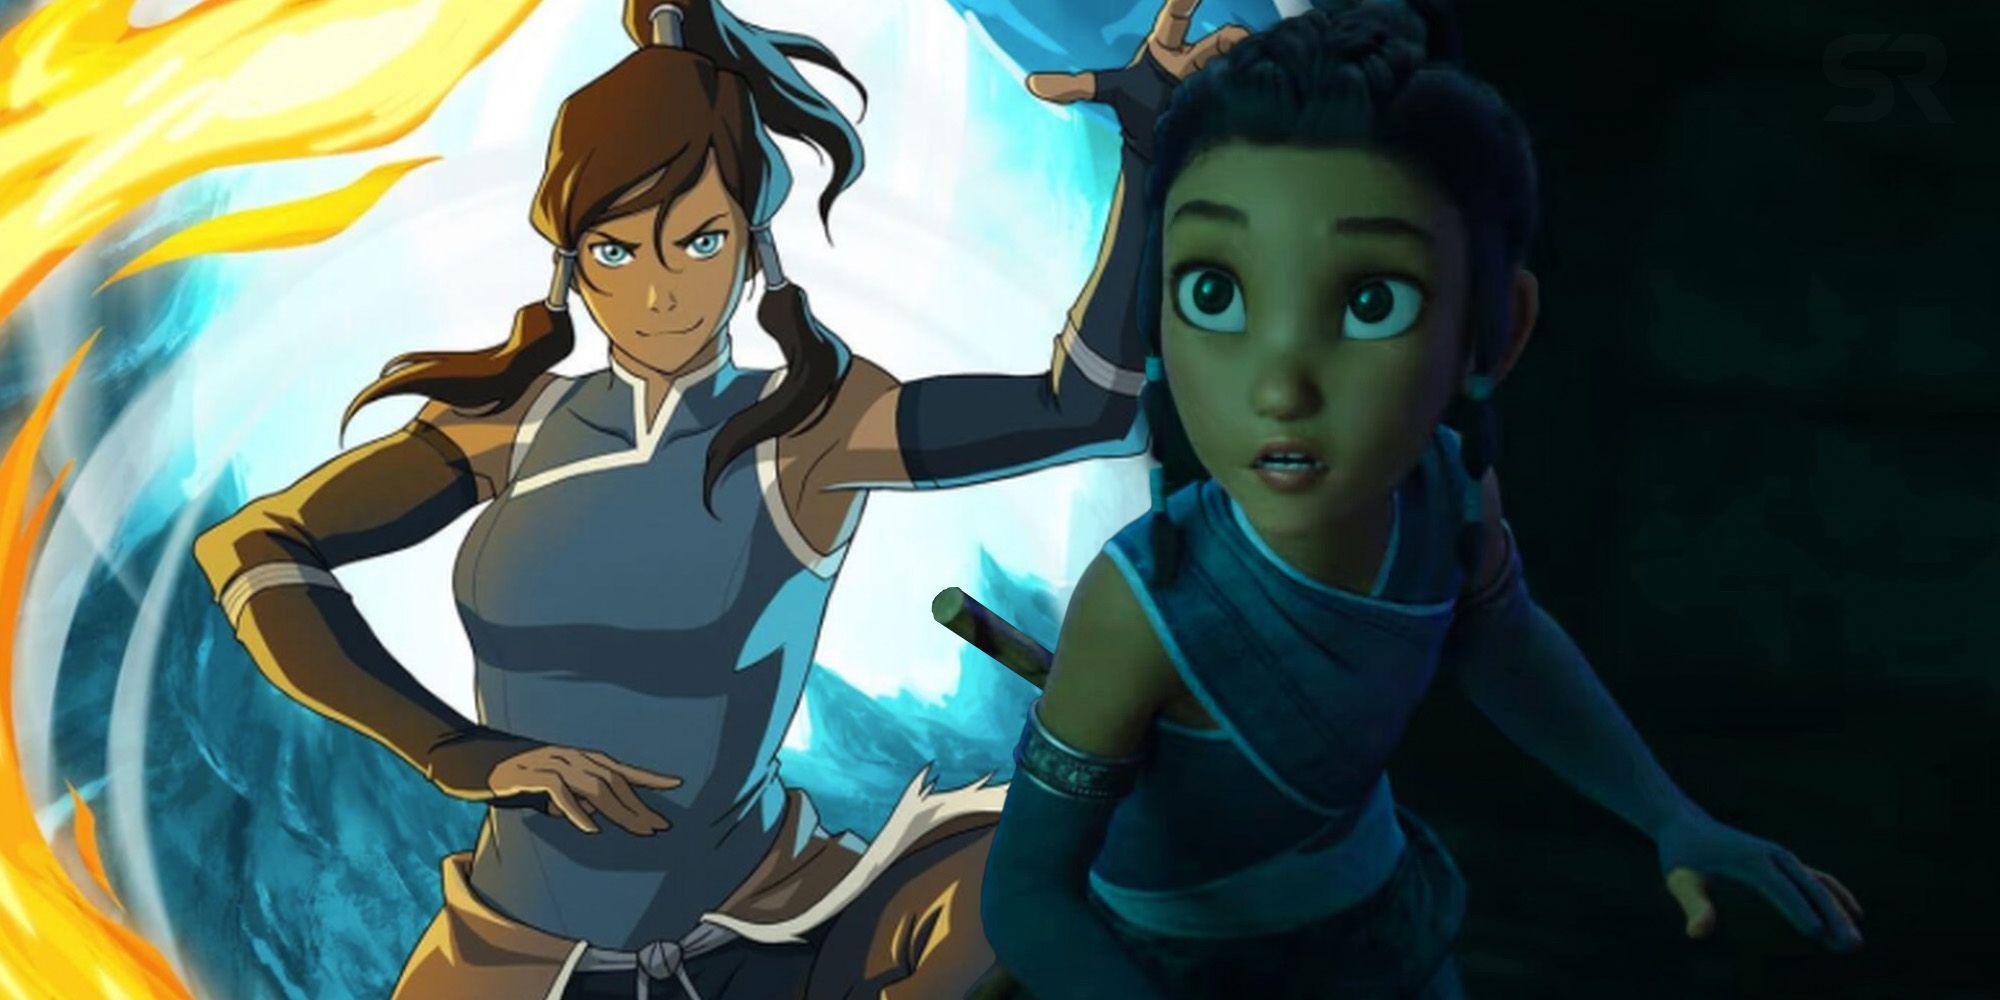 raya and the last dragon korra